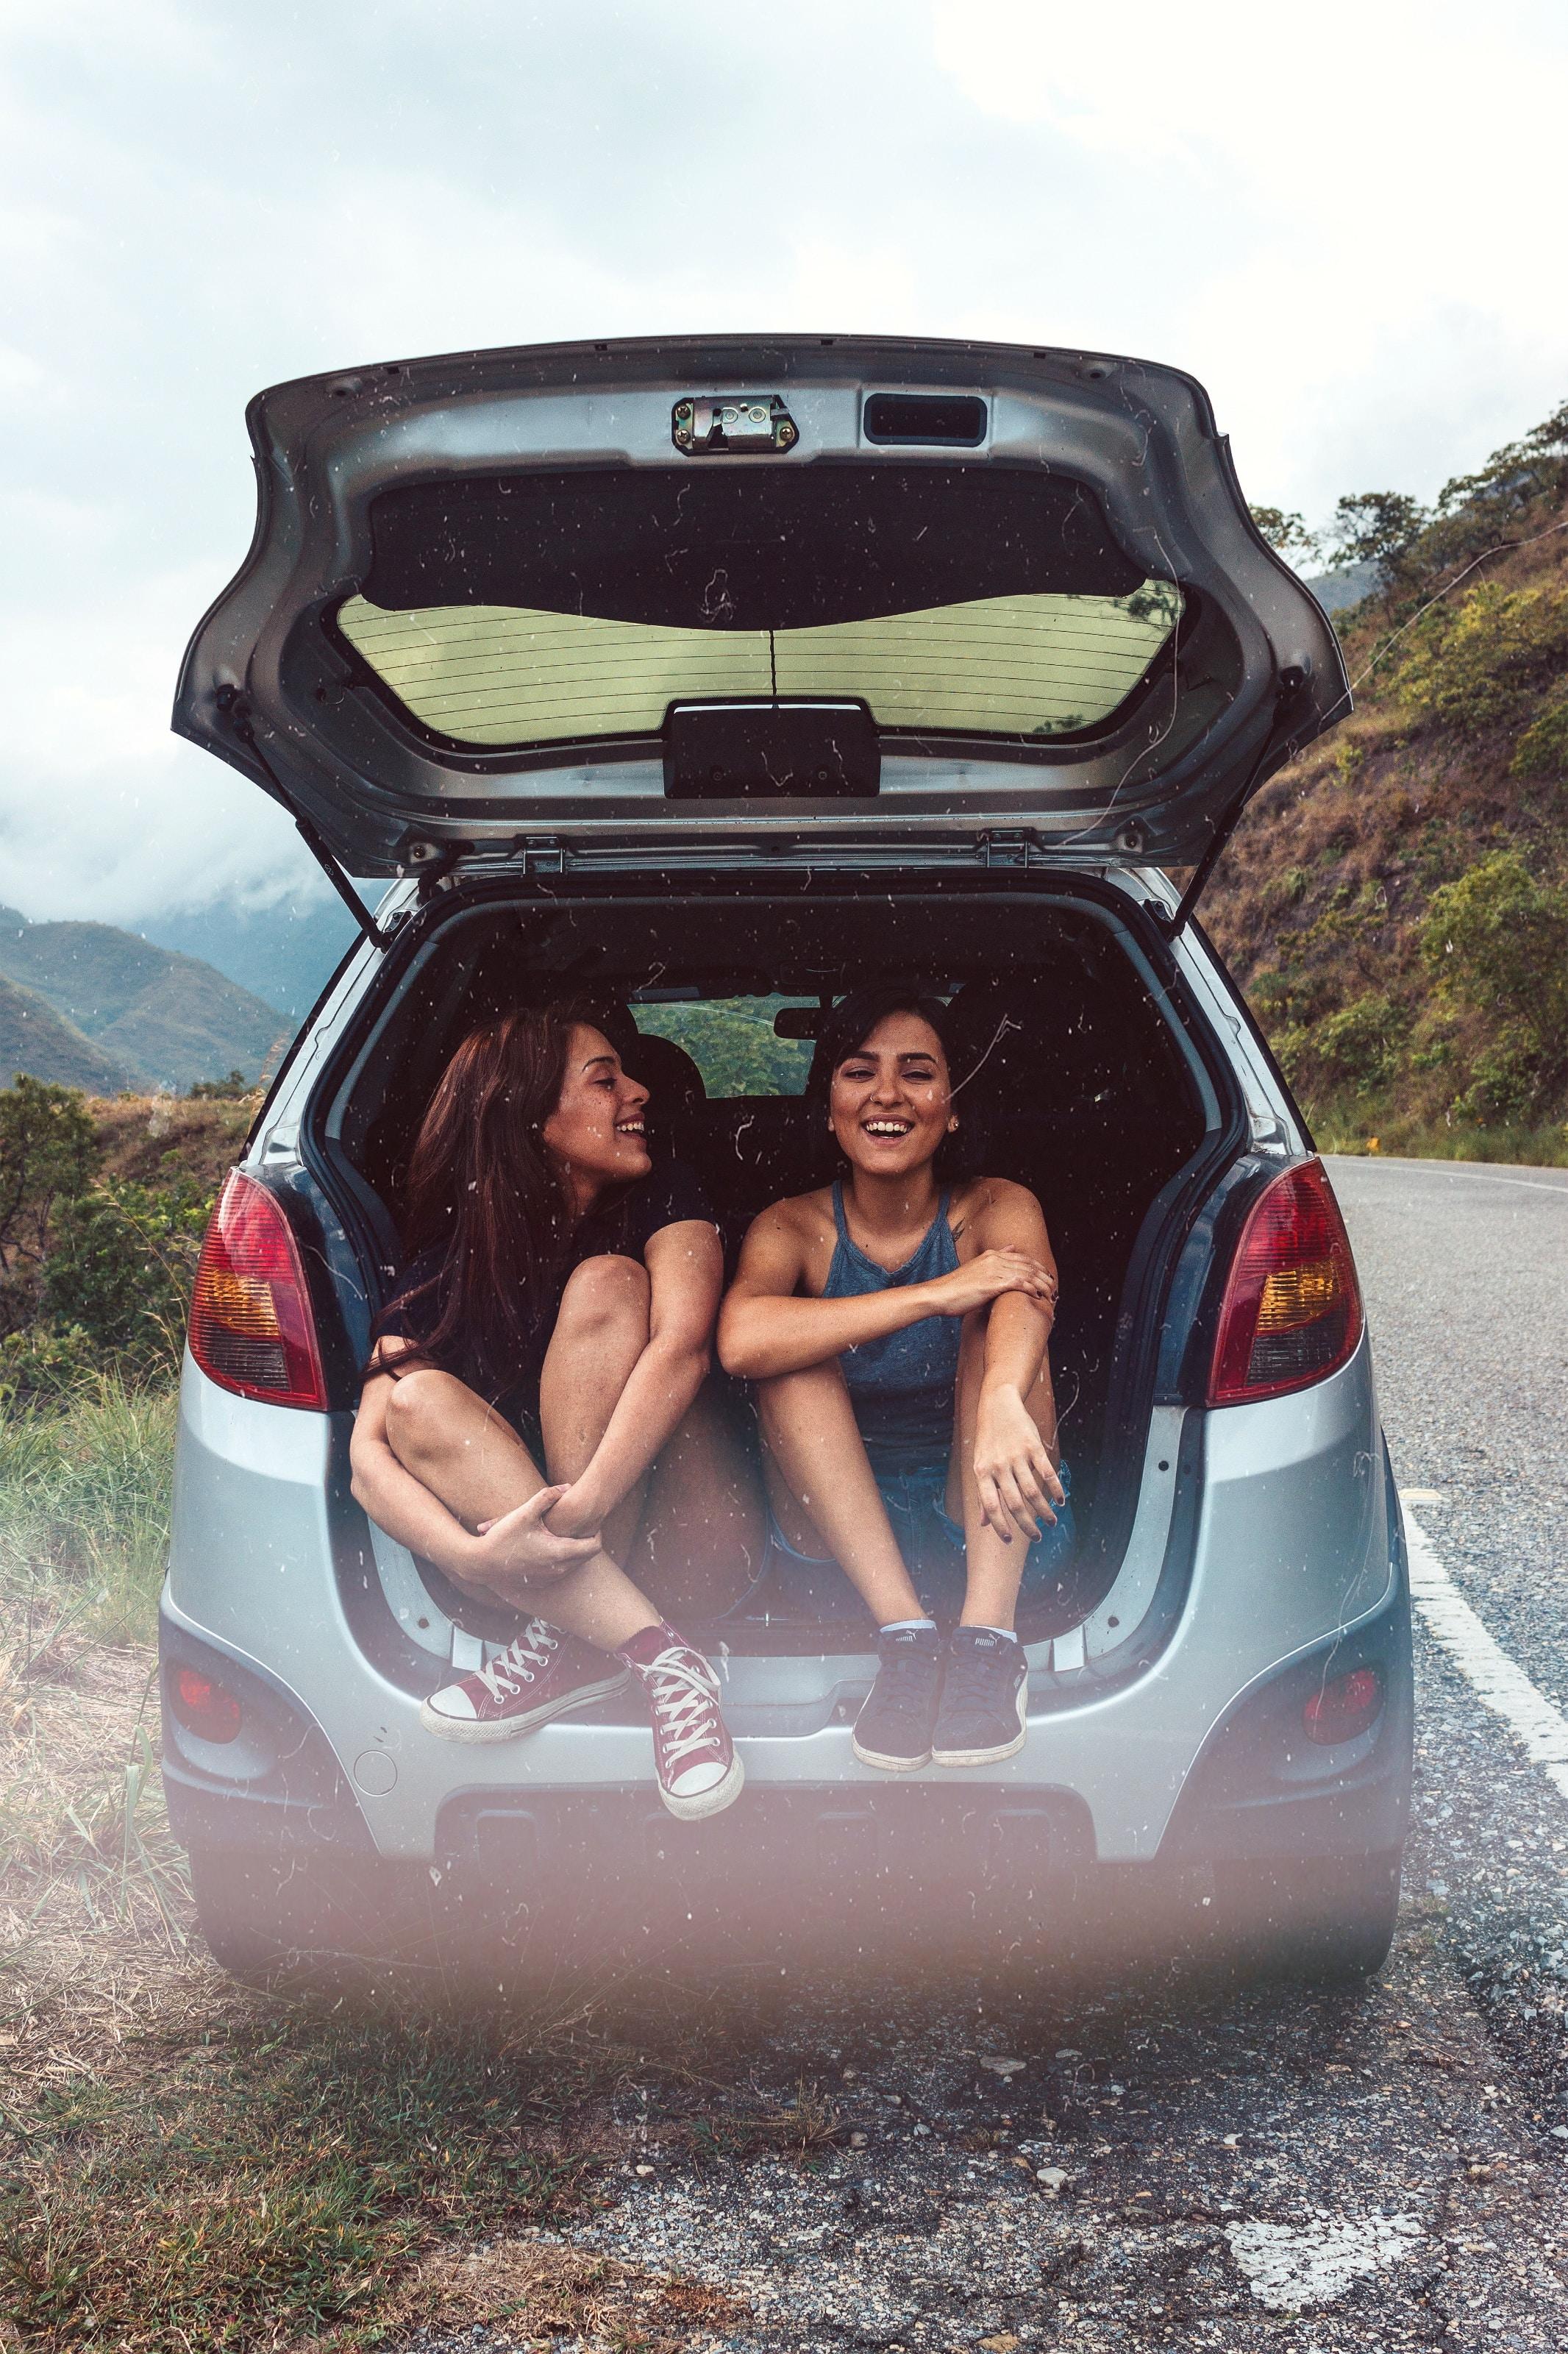 mobile01 車款,選擇 mobile01,分享 mobile01,心得 心得,分享 機車,車款 dcard,dcard 心得,分享 分享,dcard 心得,車款 分享